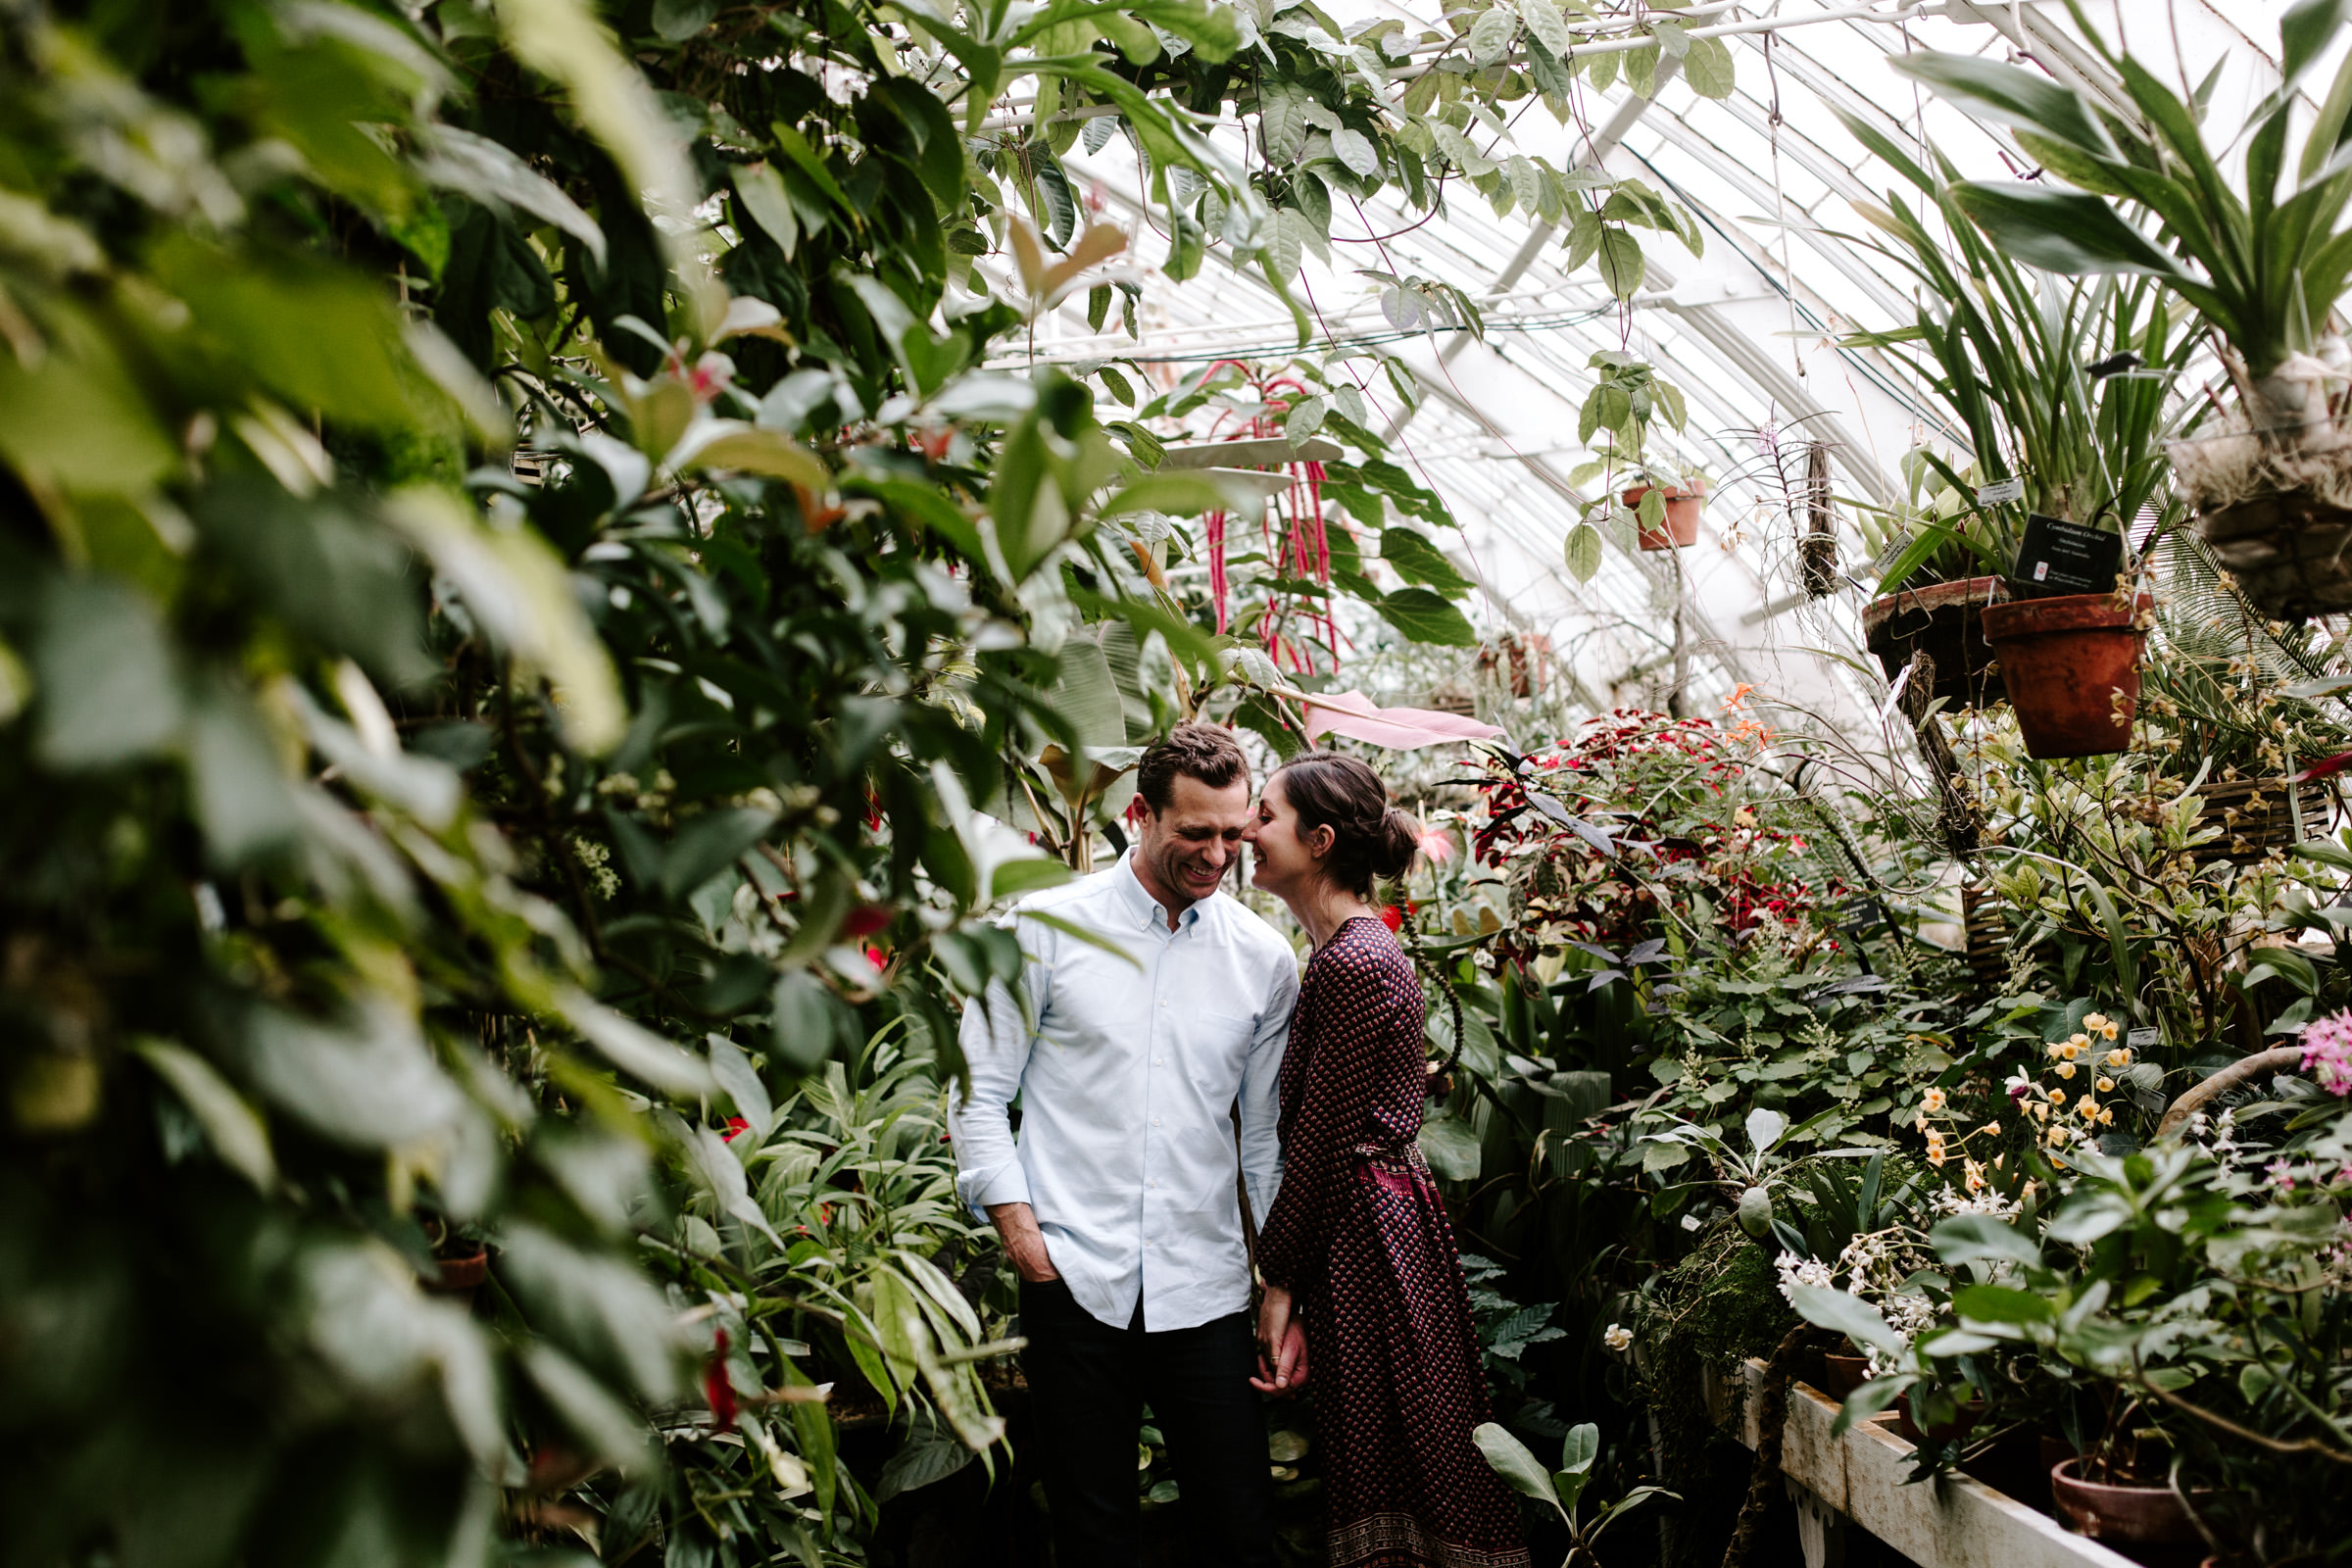 San-Francisco-Photographer-Pierce-Weddings-69.jpg